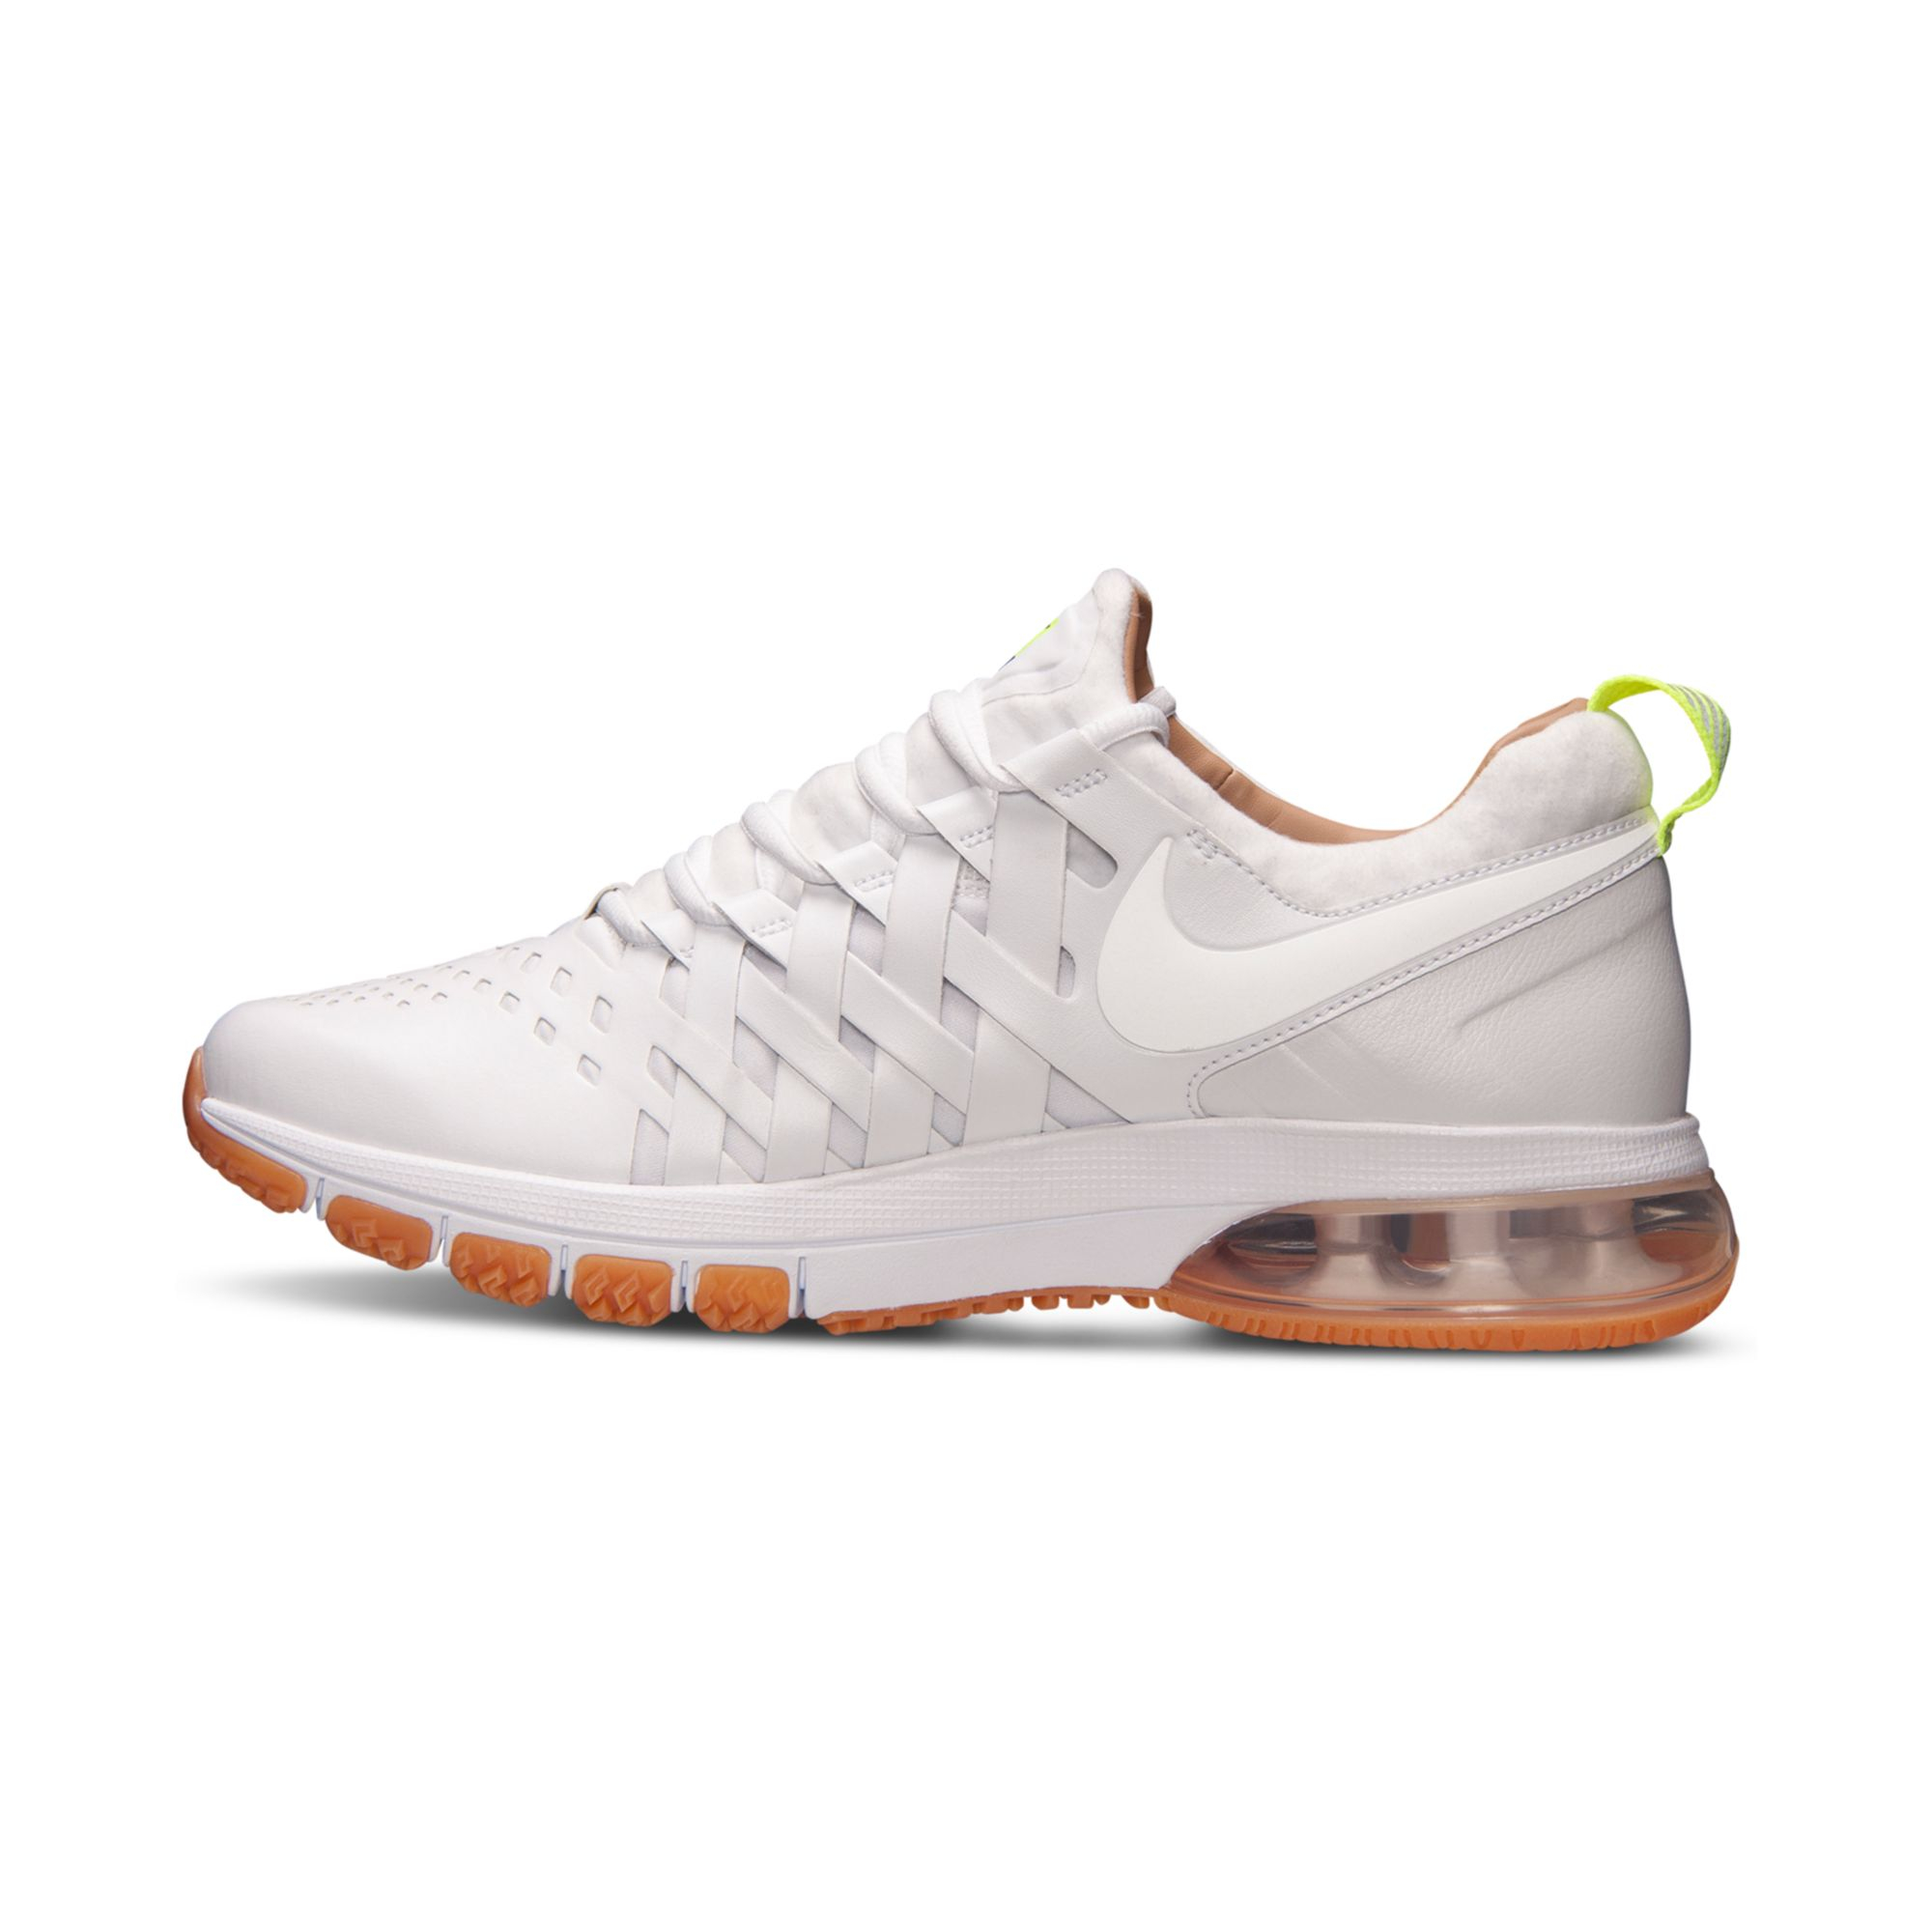 nike fingertrap air max premium training sneakers in white. Black Bedroom Furniture Sets. Home Design Ideas